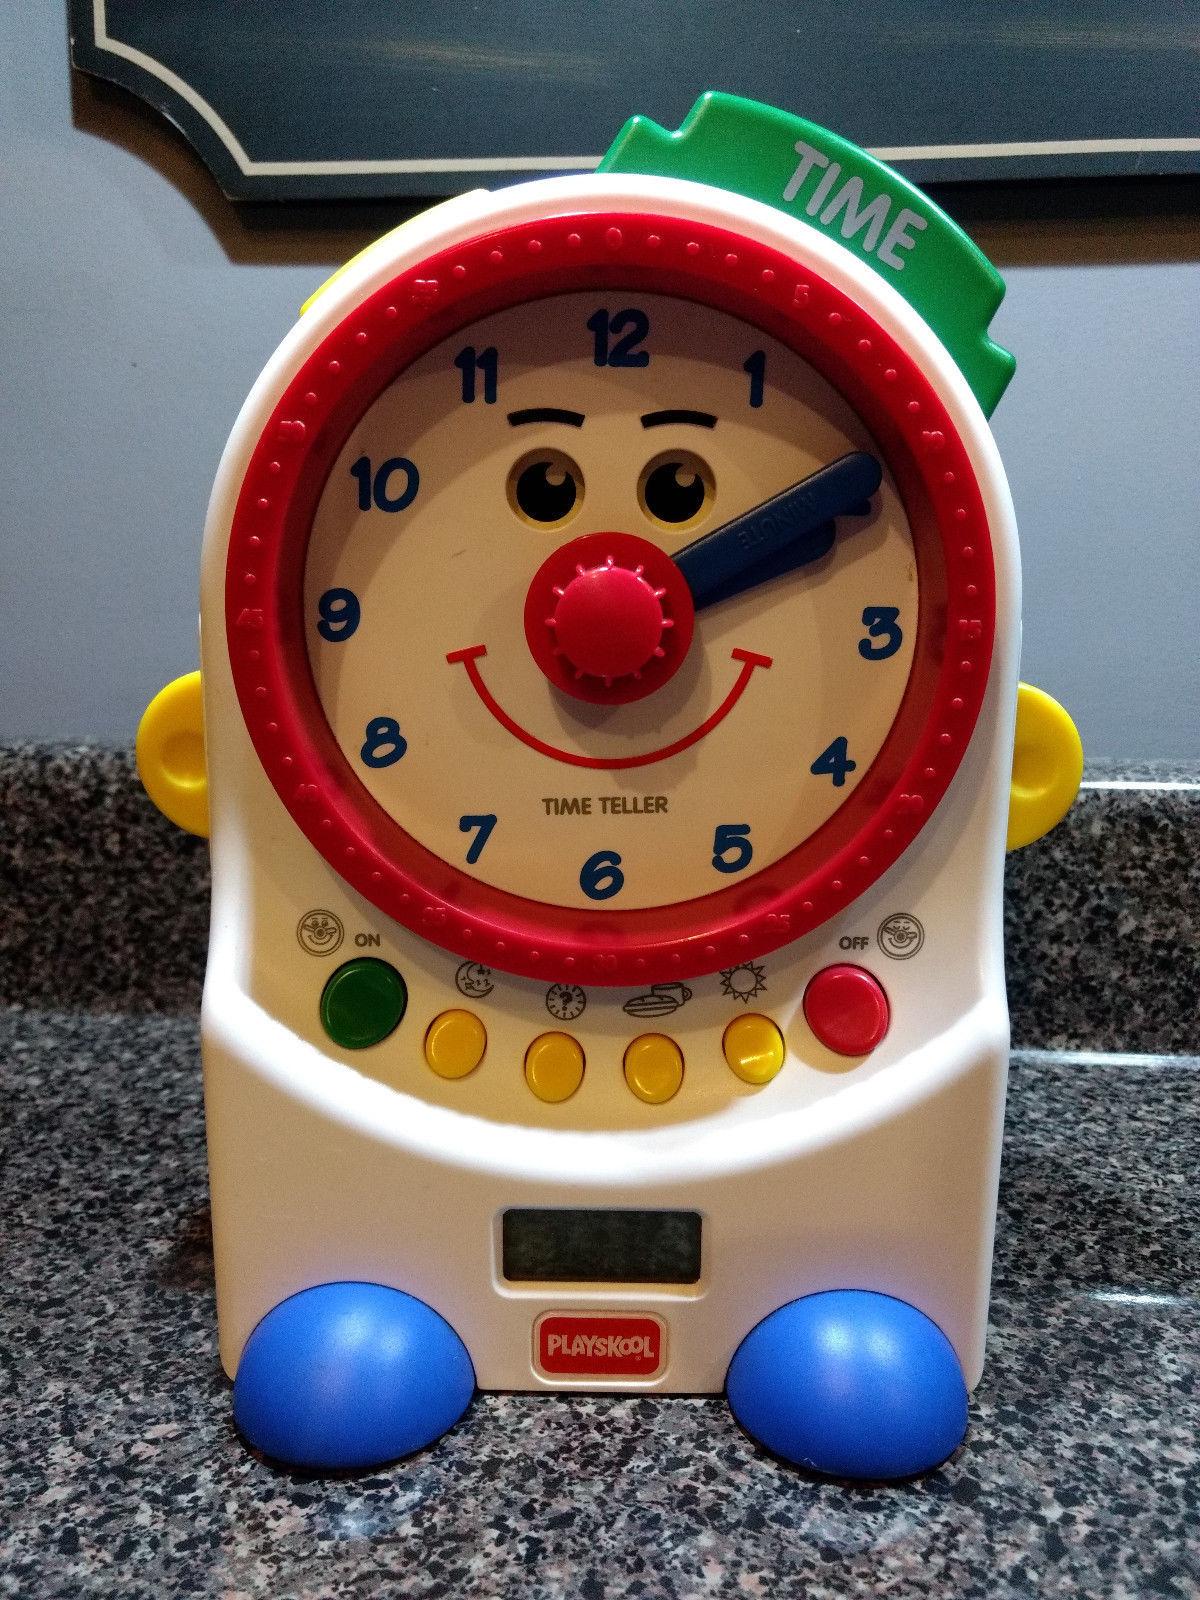 Playskool Teachin Time Talking Clock Toy Digital and Dial 1995 PS-725